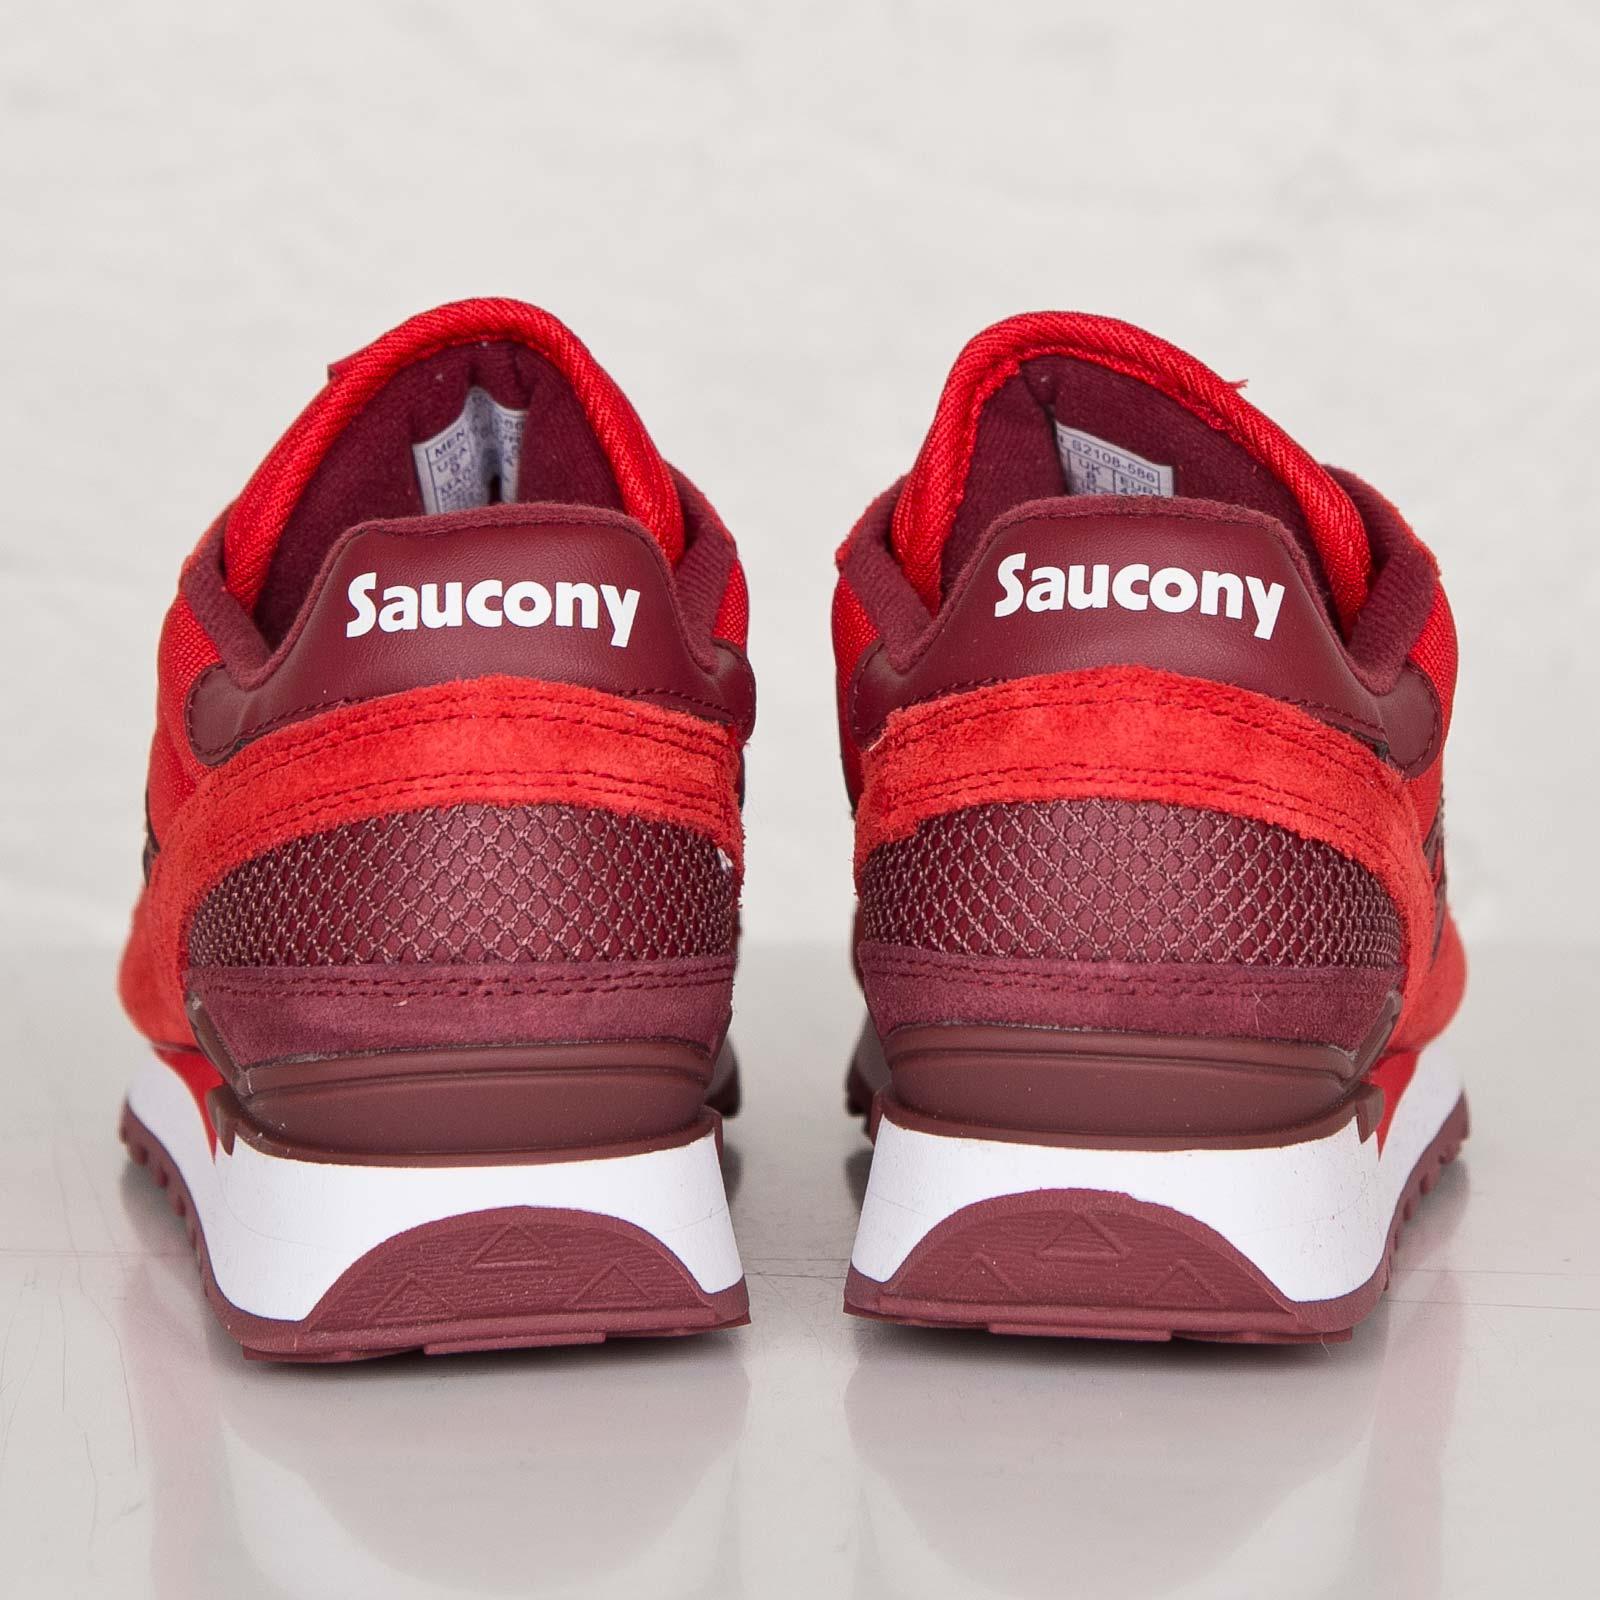 finest selection 93bd8 1c2cf Saucony Shadow Original - S2108-586 - Sneakersnstuff   sneakers    streetwear online since 1999